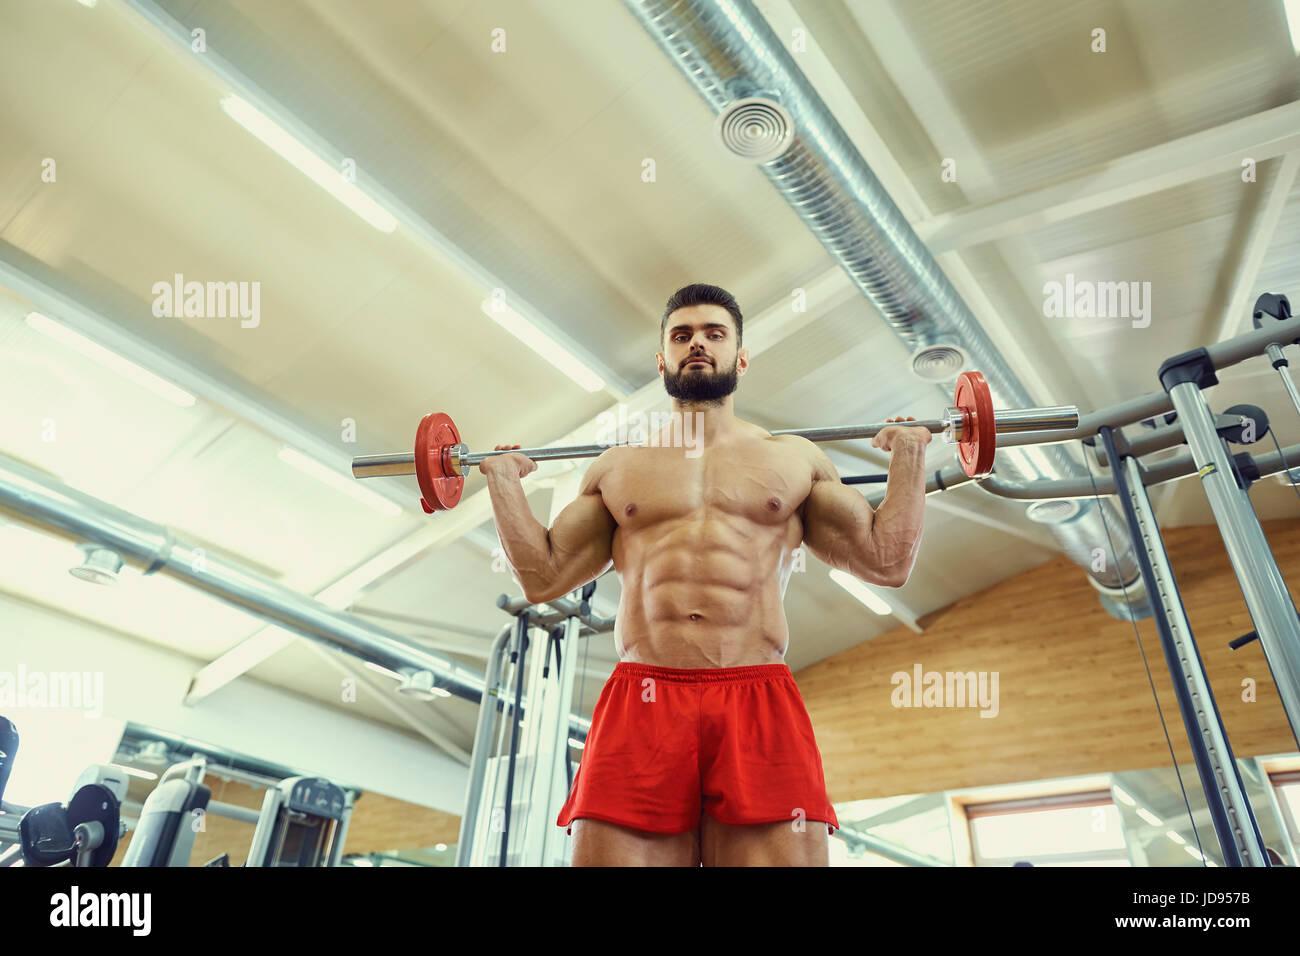 Avec un bodybuilder barbell exercices rend dans la salle de sport Photo Stock